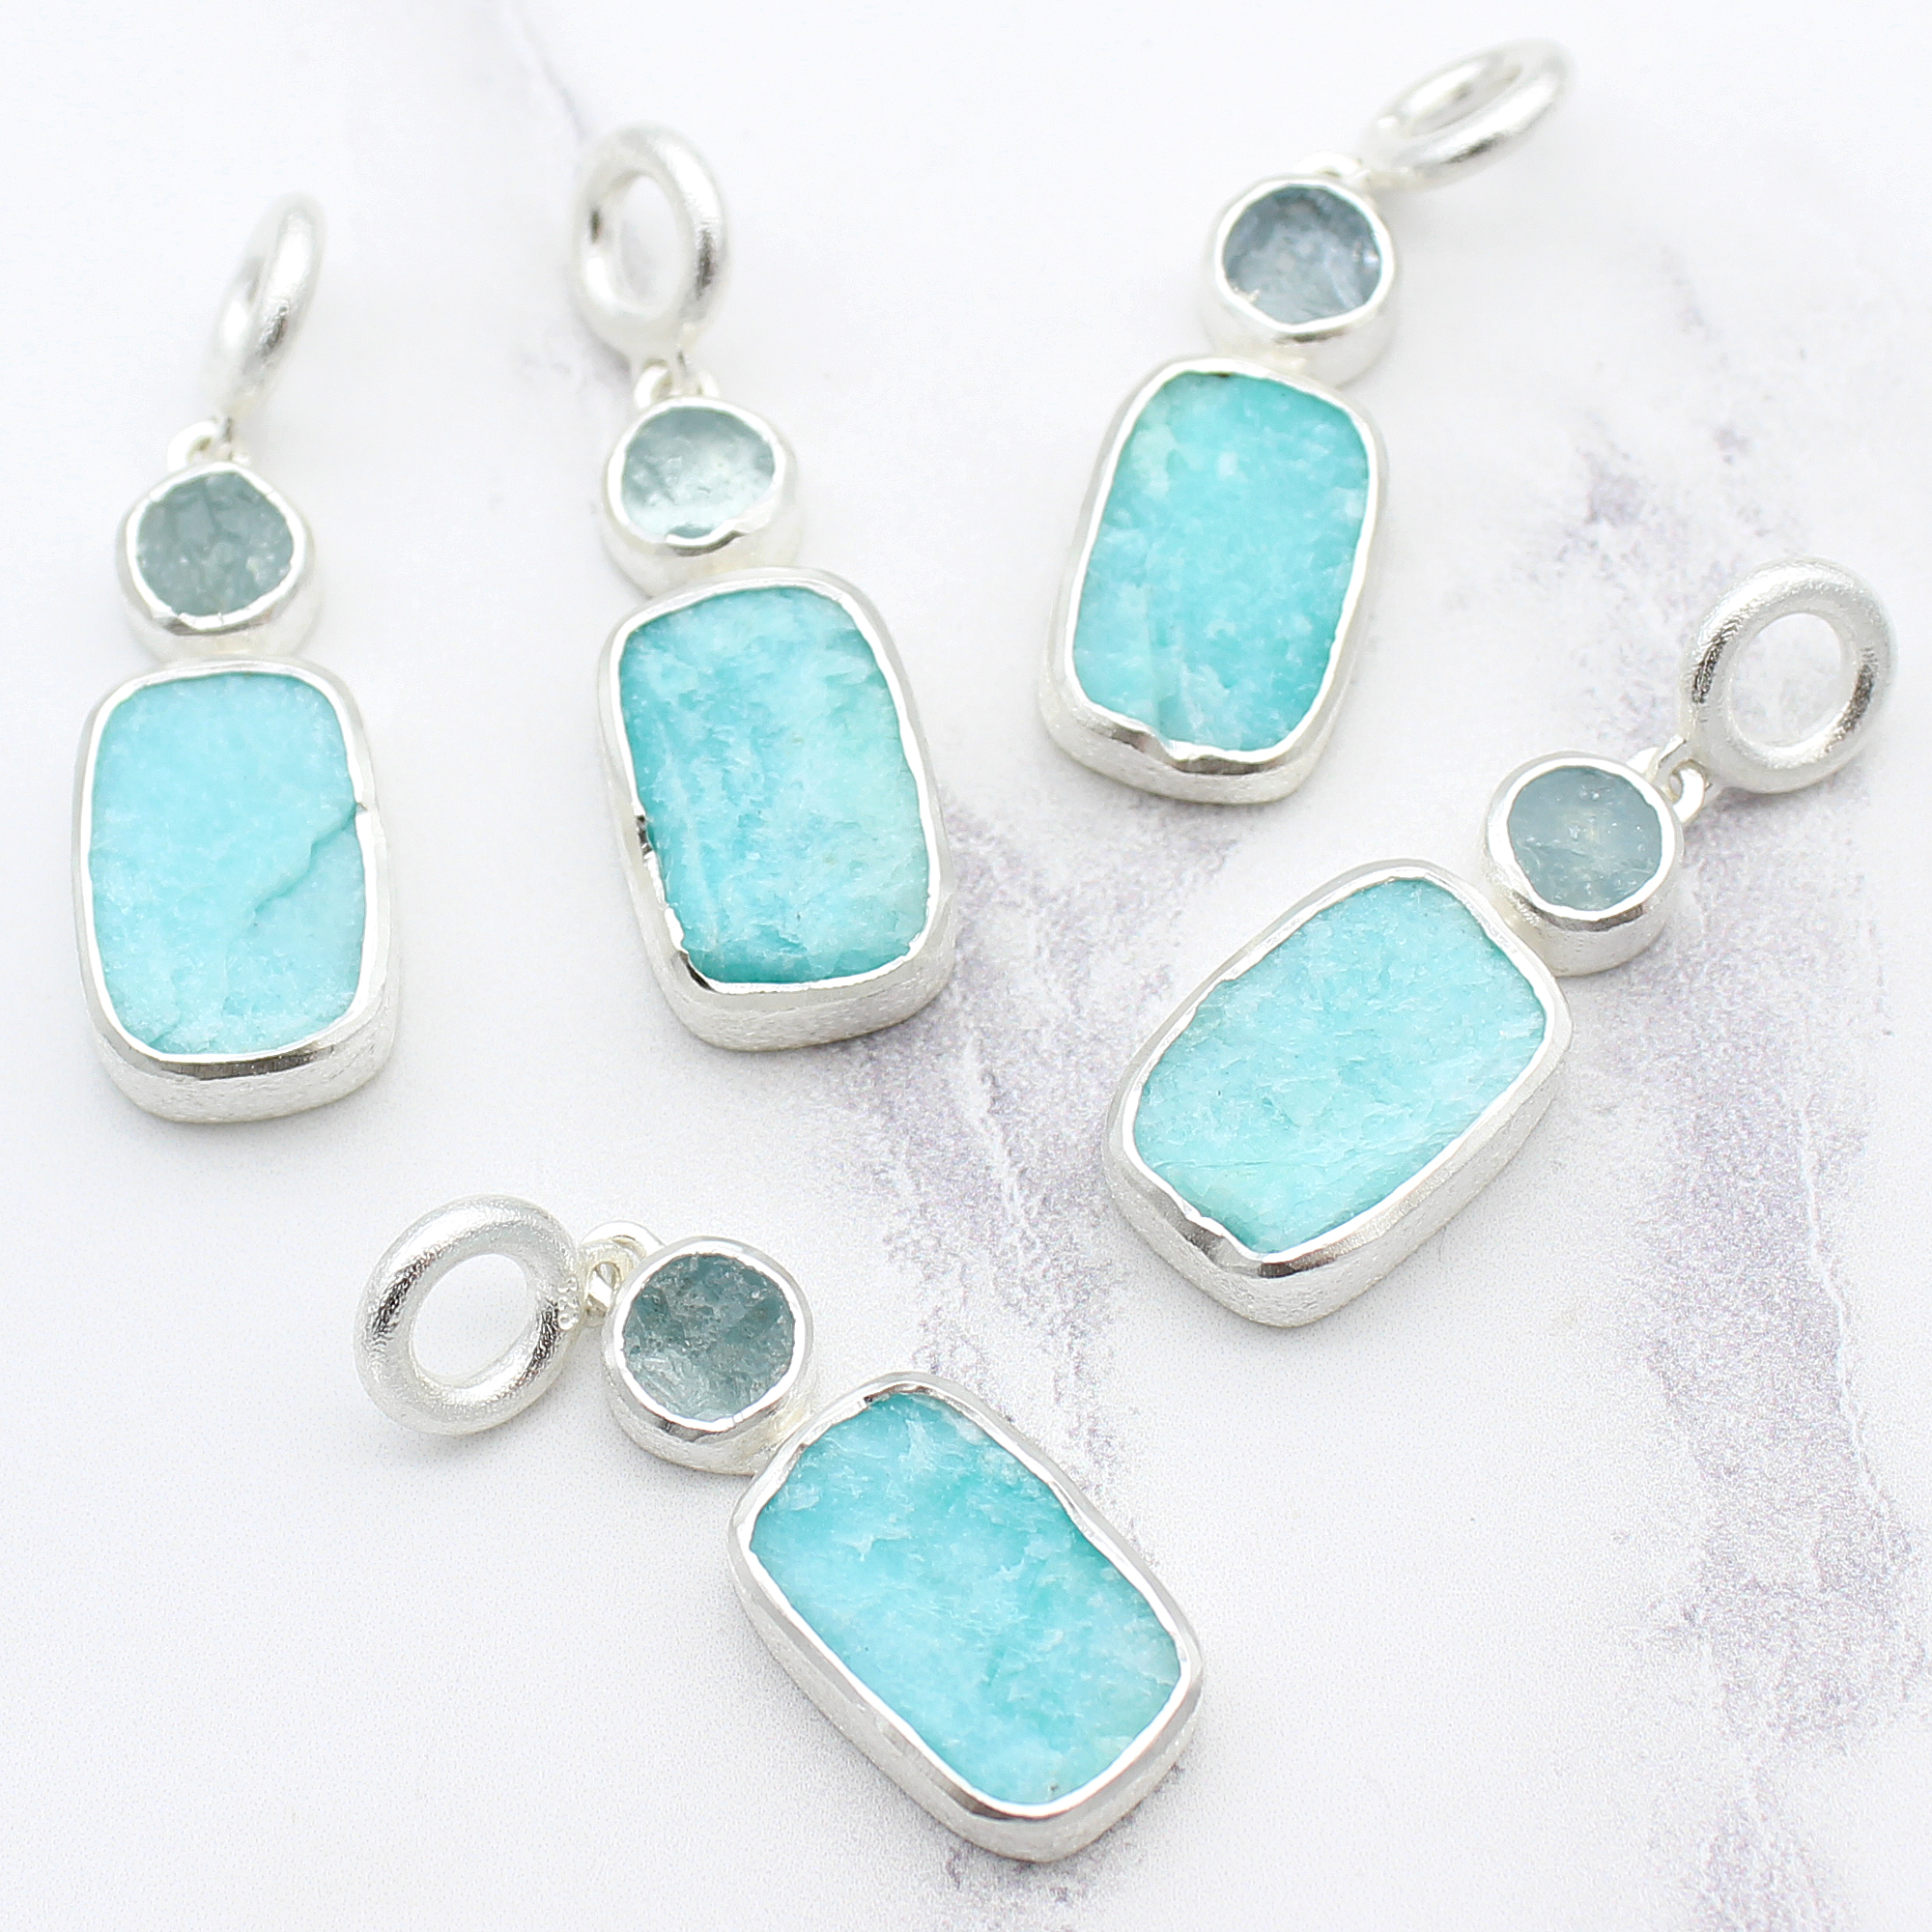 Aquamarine And Amazonite Gemstone Handmade Sterling Silver Pendant